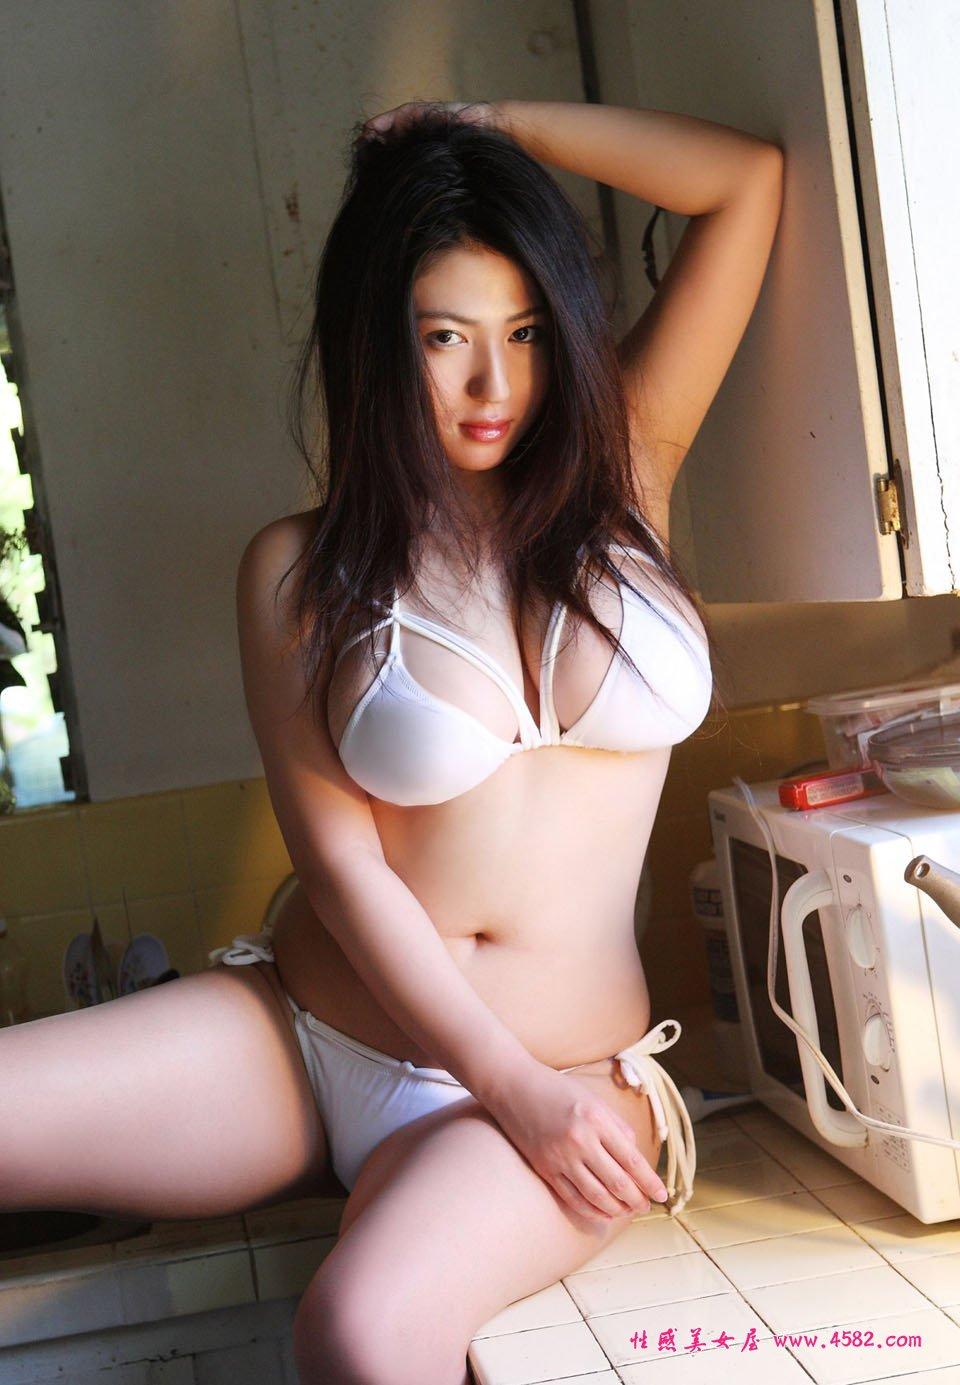 foto seksi nonami takizawa si cantik dada super artis montok cantik